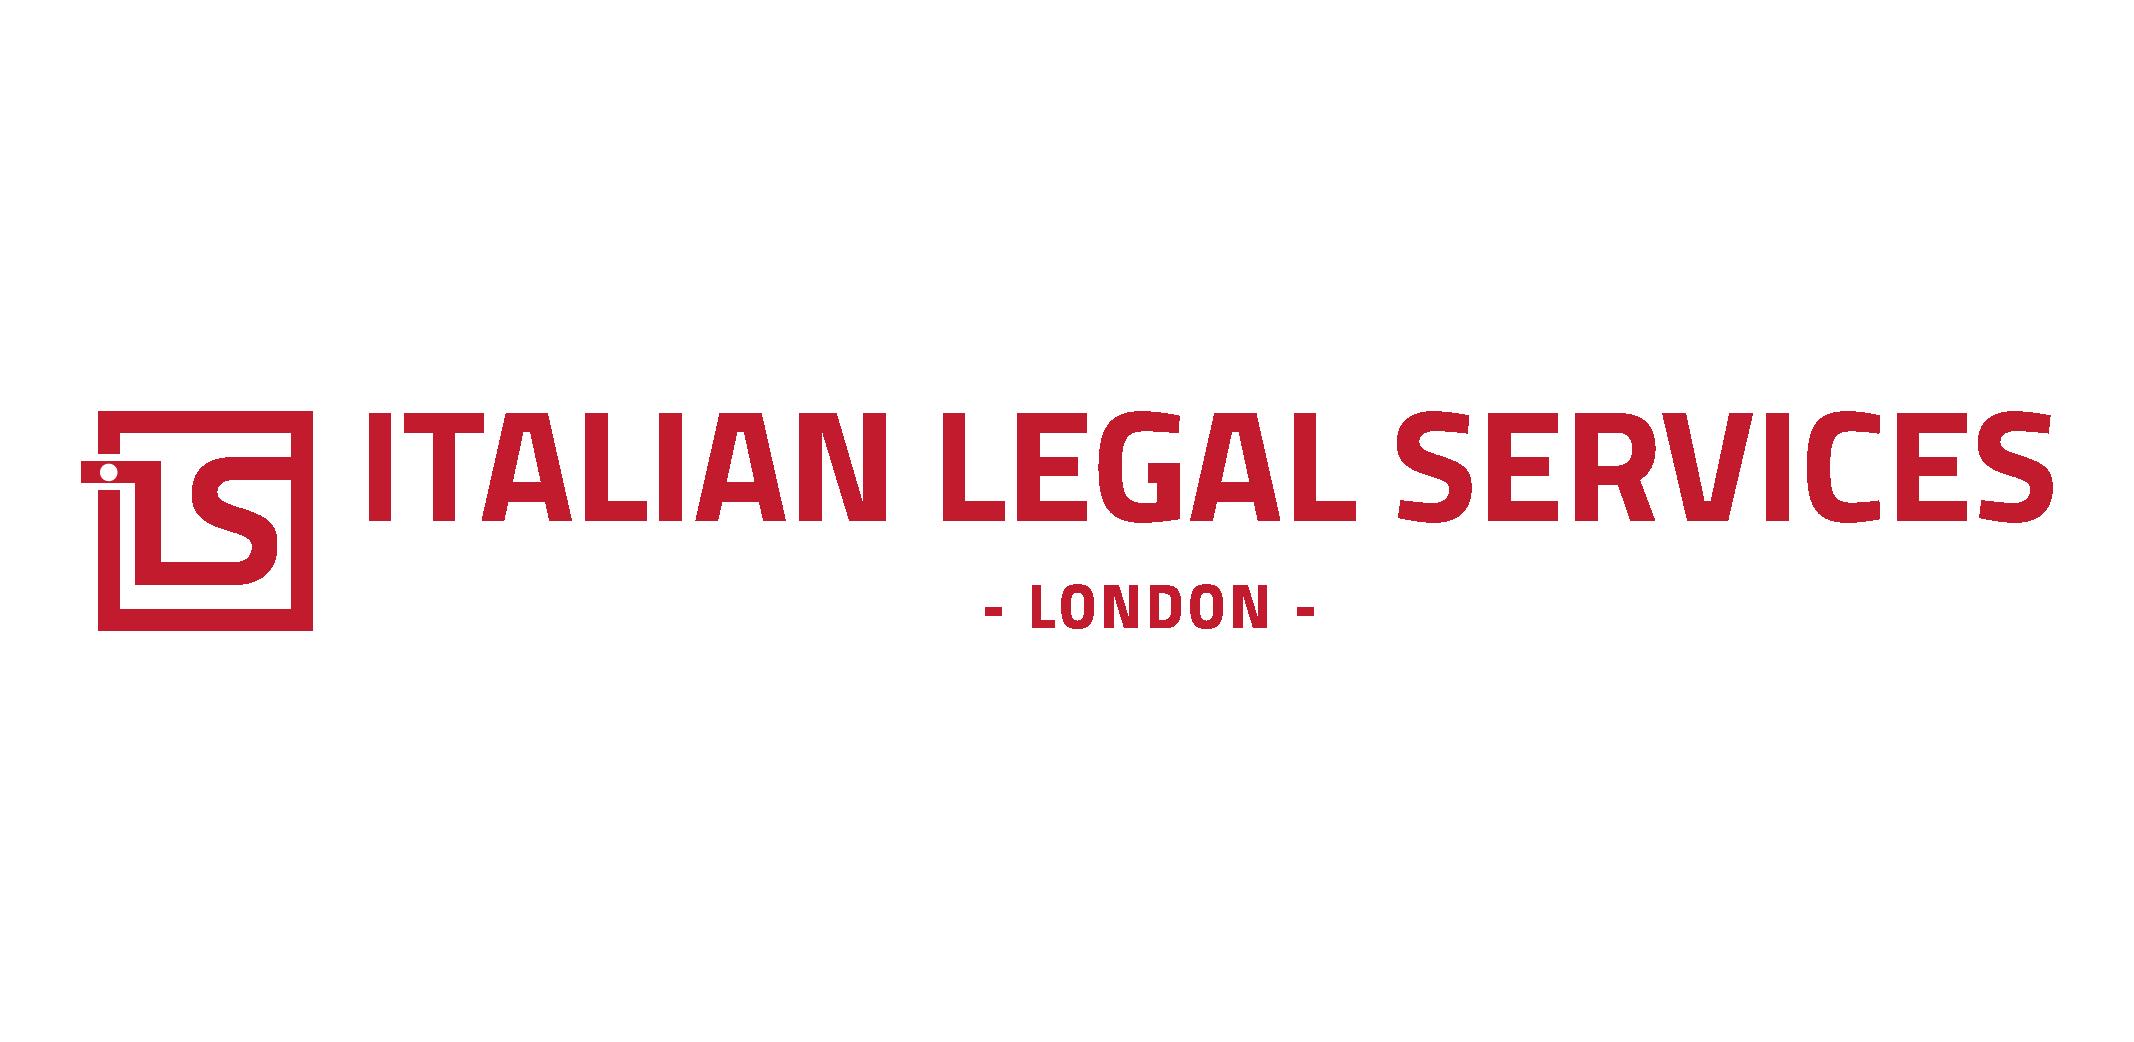 Italian Legal Services